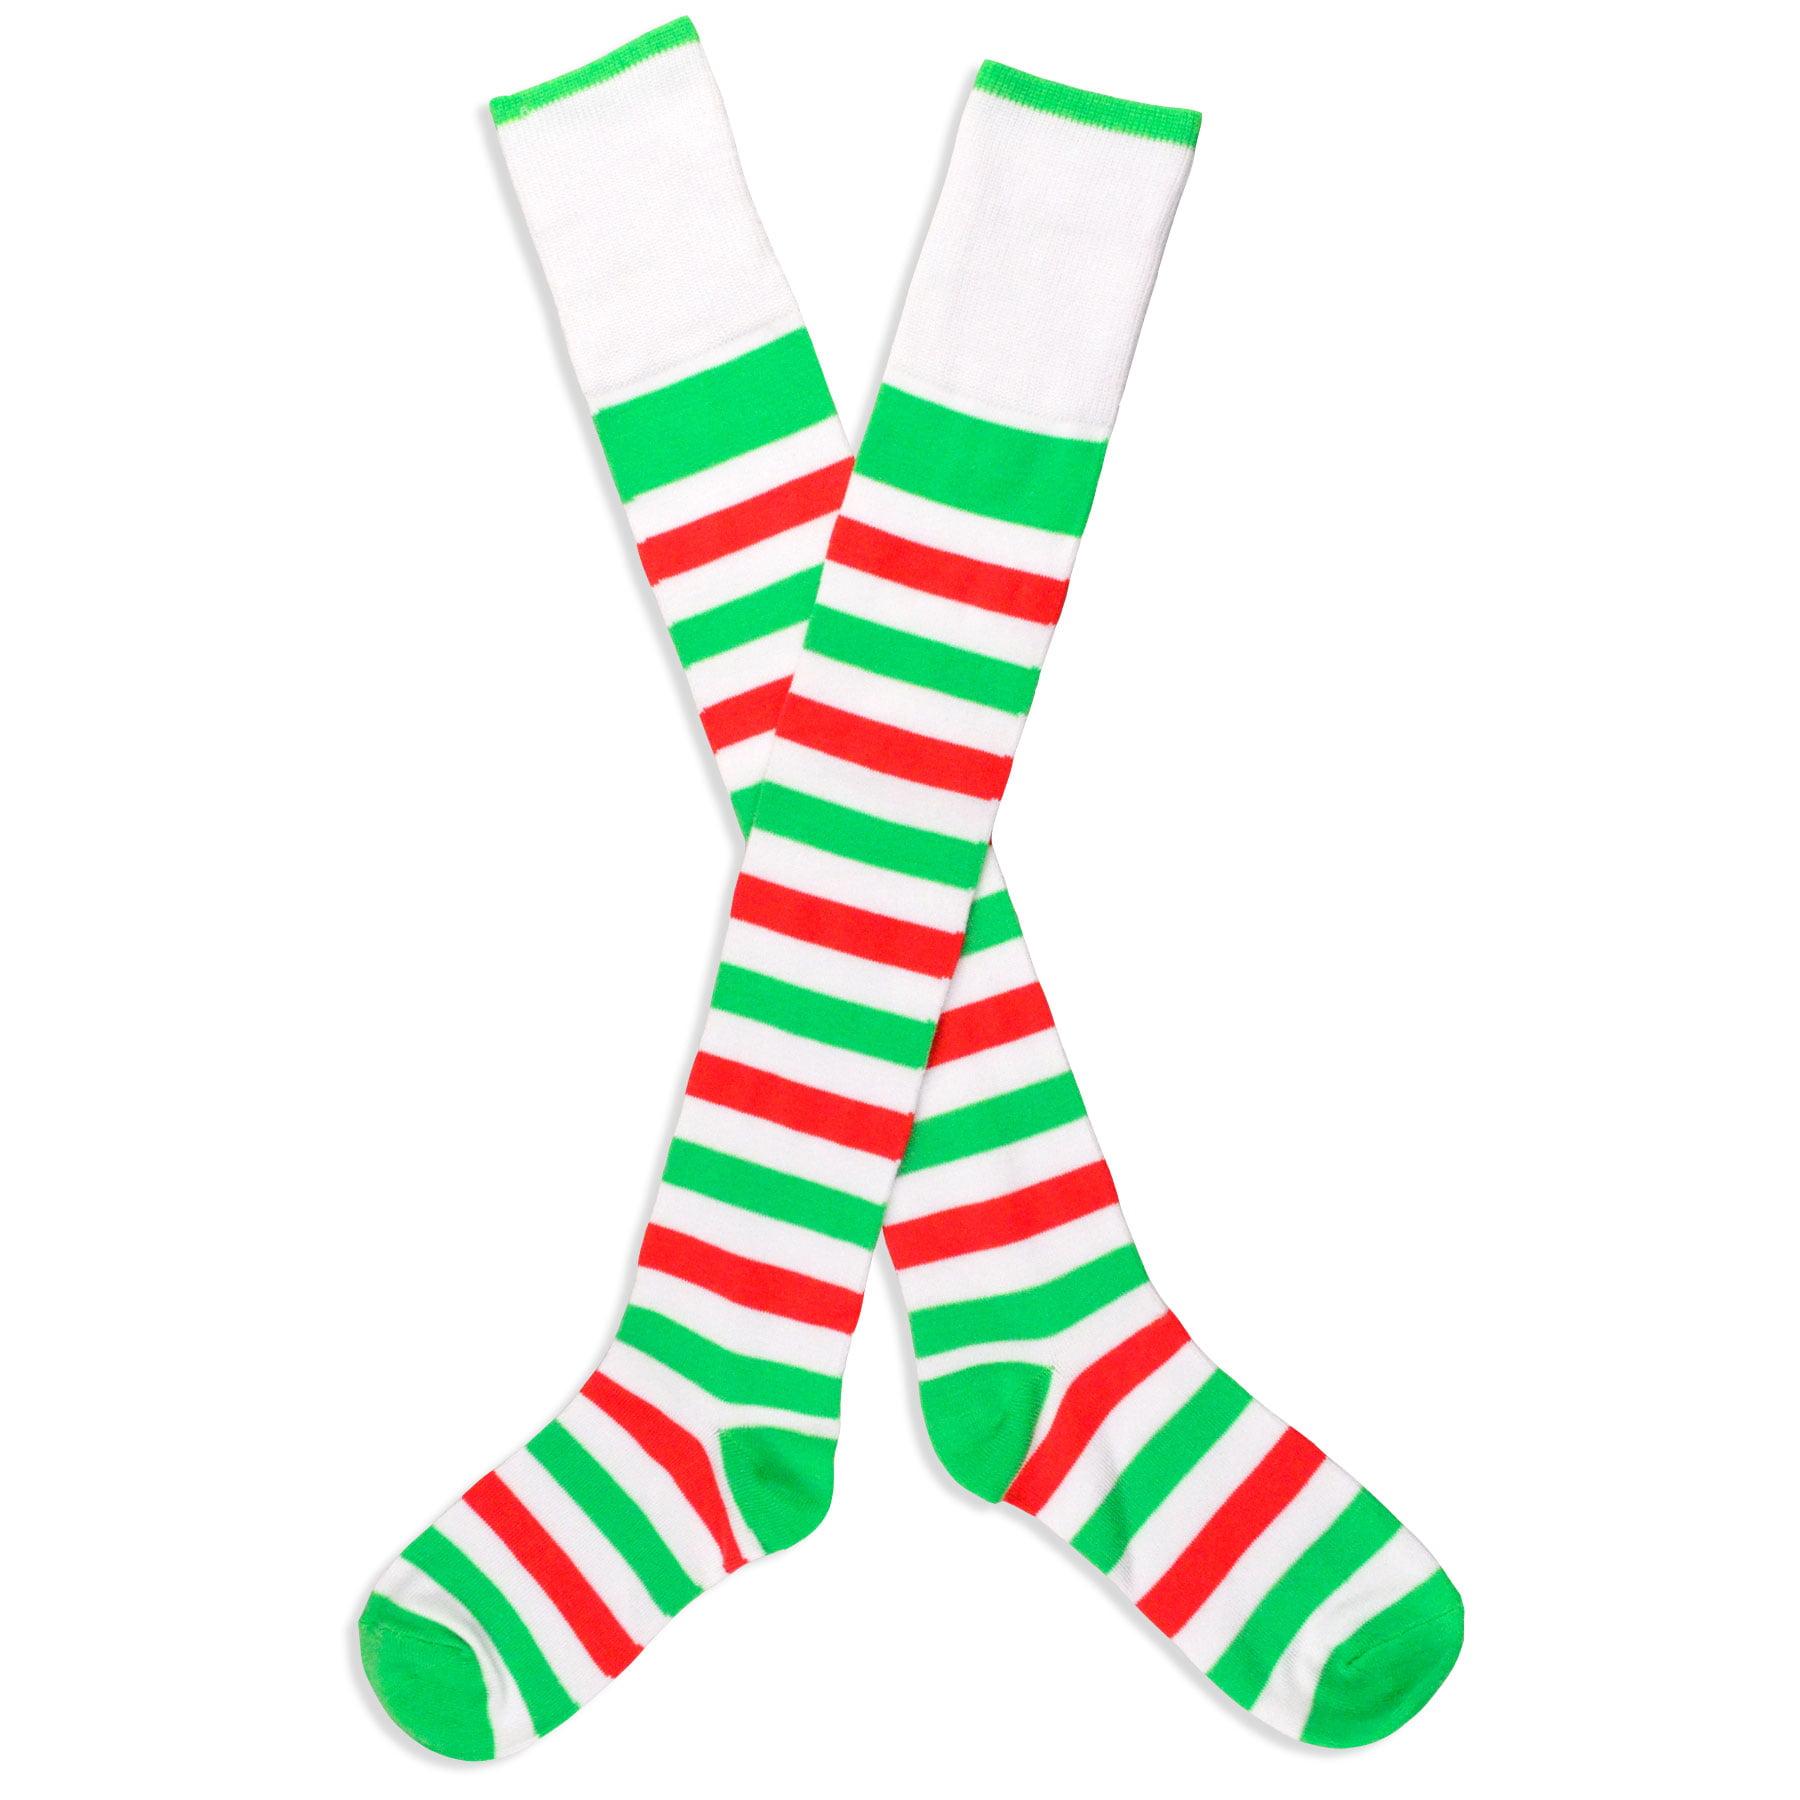 TeeHee Christmas Holiday Socks - Black and White Stripe Over the Knee High  - Walmart.com